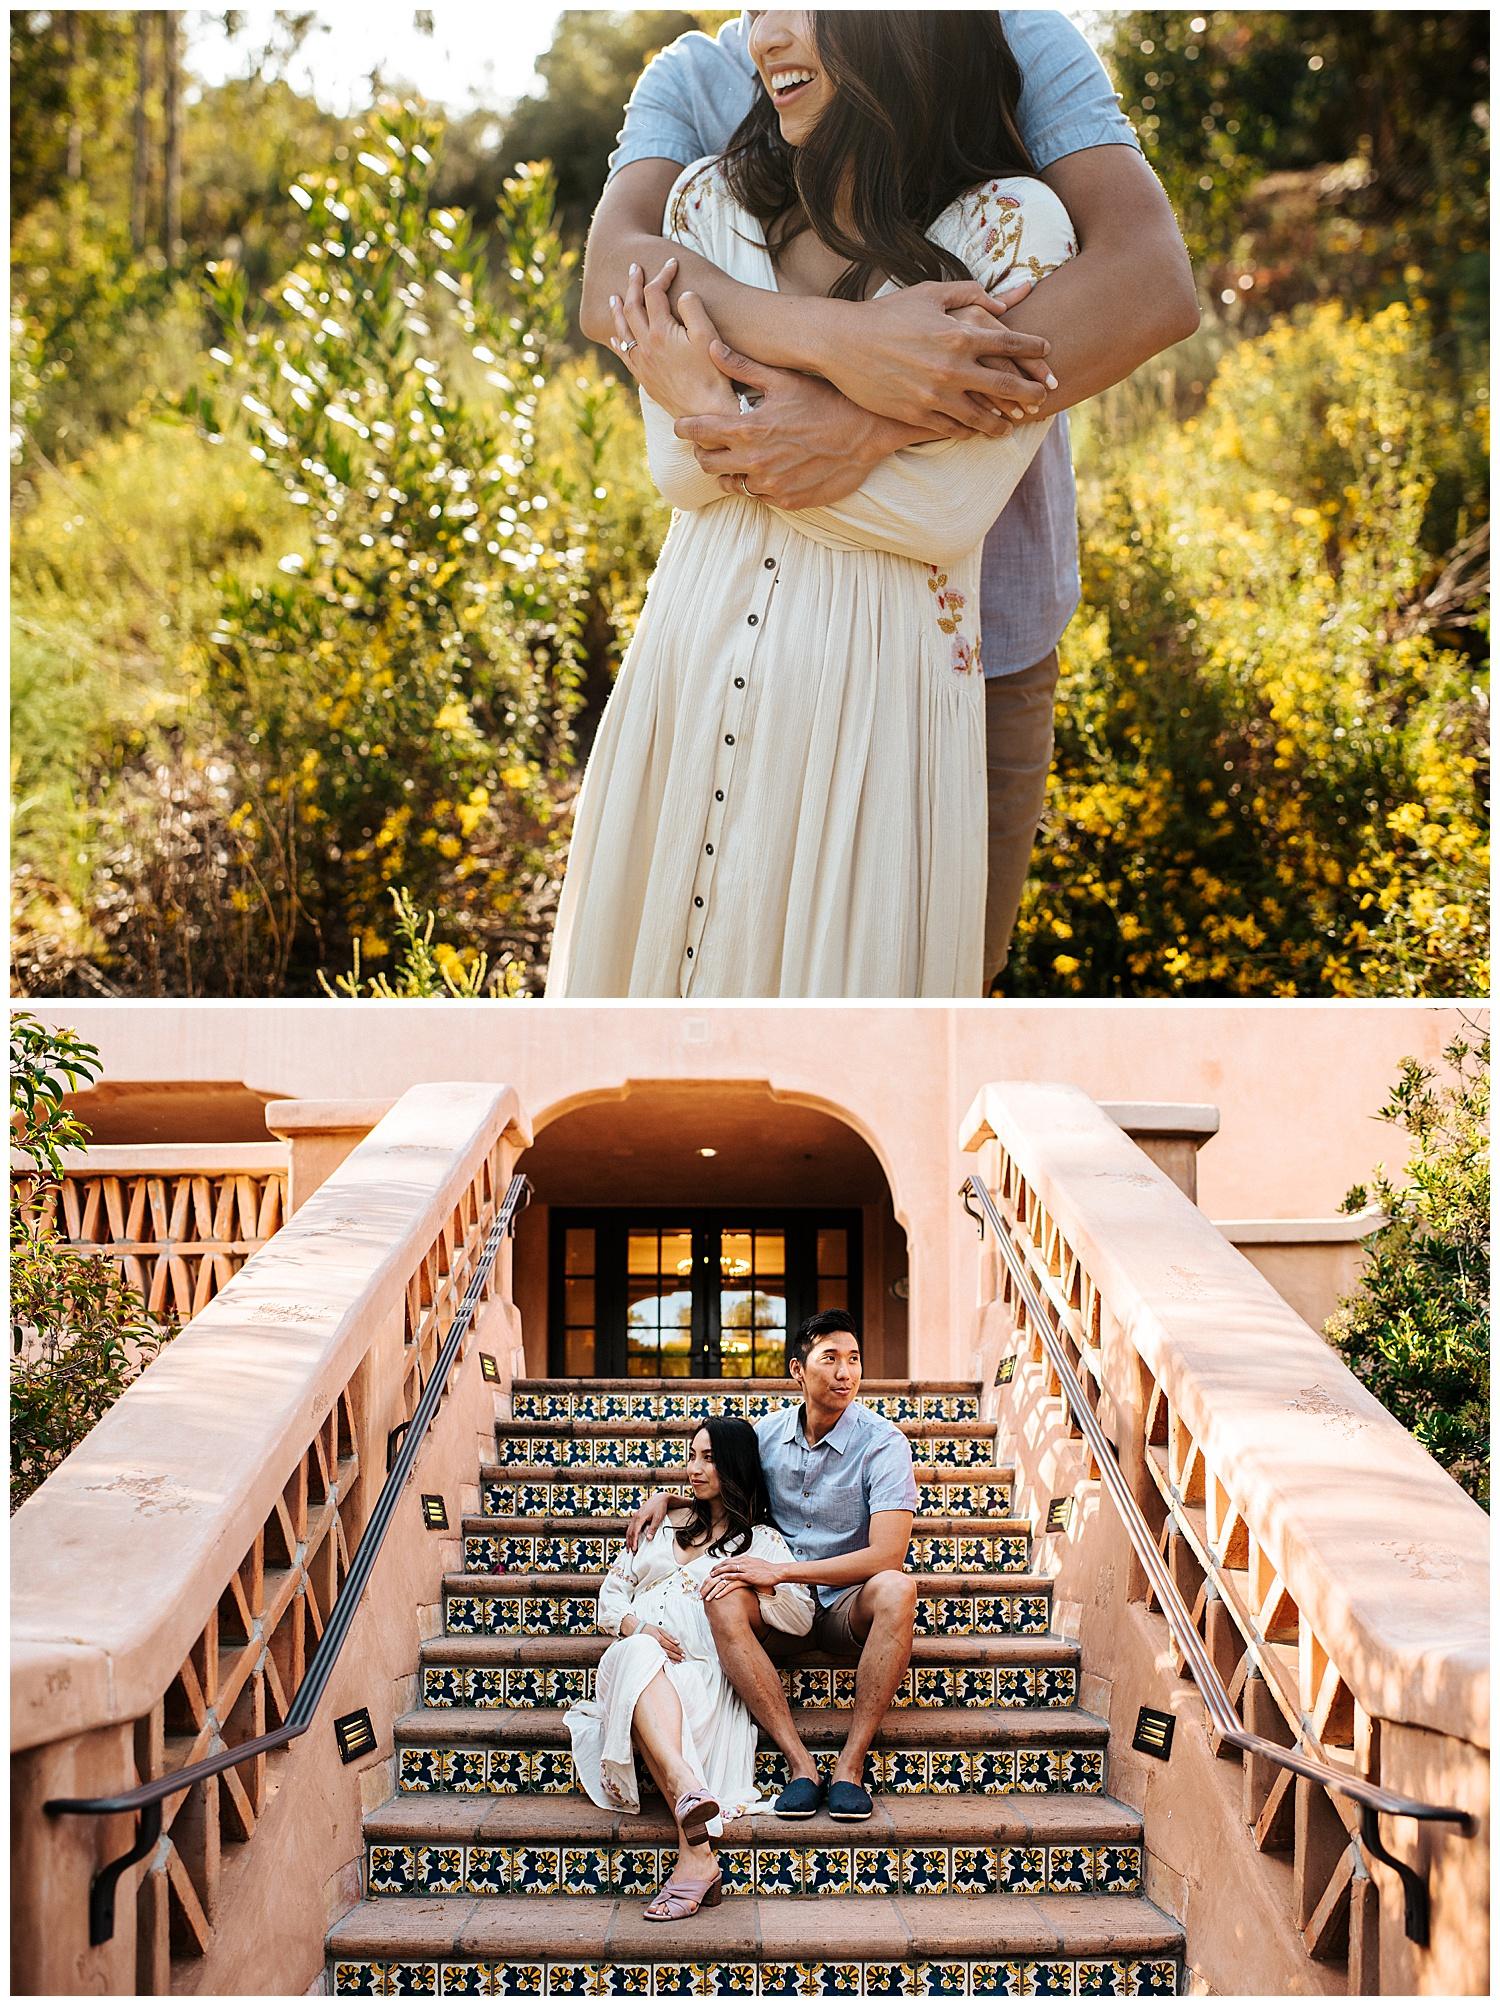 SamErica Studios - San Diego Maternity Photographer - Modern Palm Tree Desert Oasis Maternity Session - San Diego Babymoon at the Villas at Rancho Valencia_0015.jpg